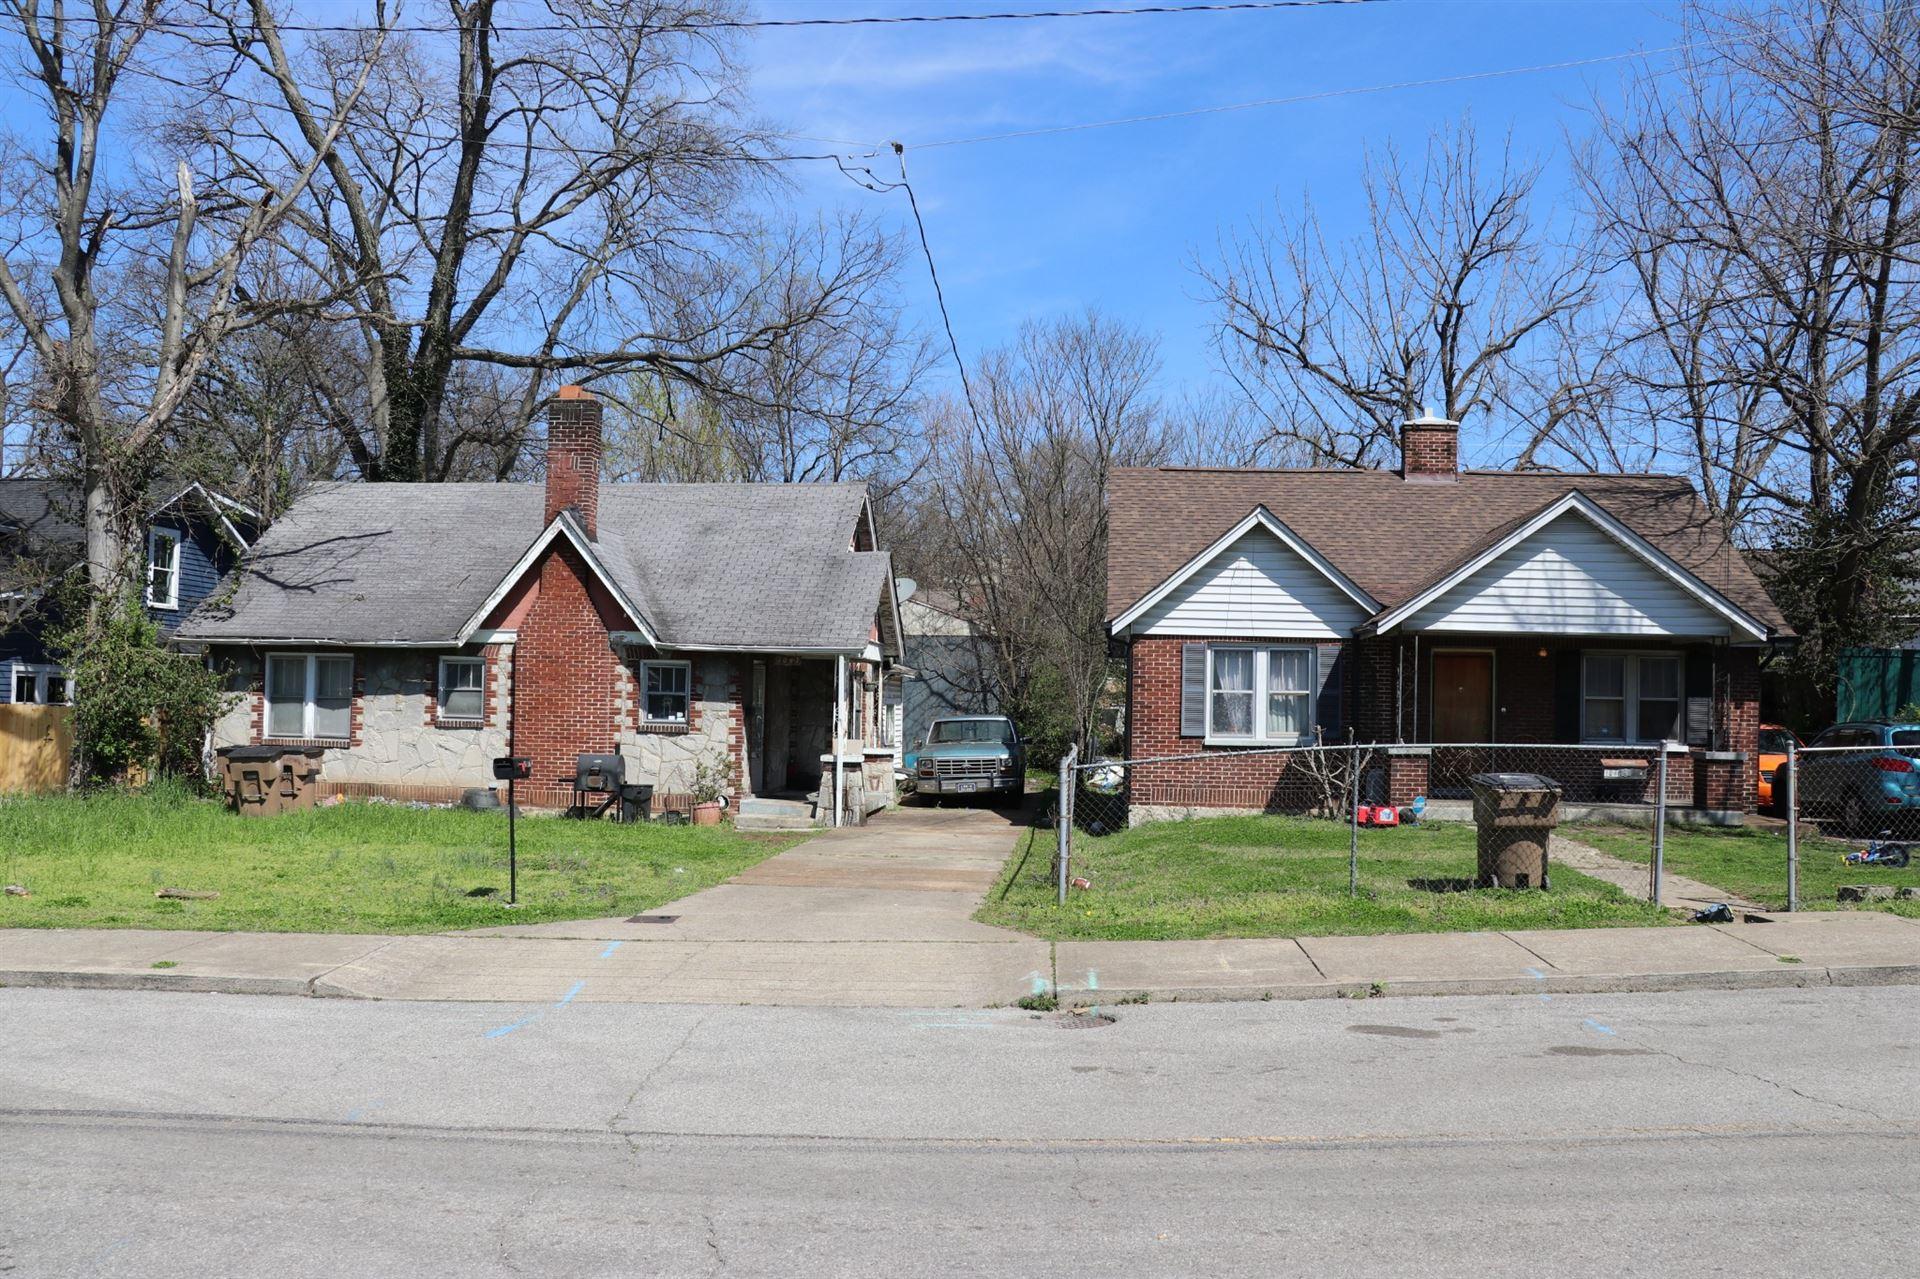 Photo of 1047 Sharpe Ave, Nashville, TN 37206 (MLS # 2244441)